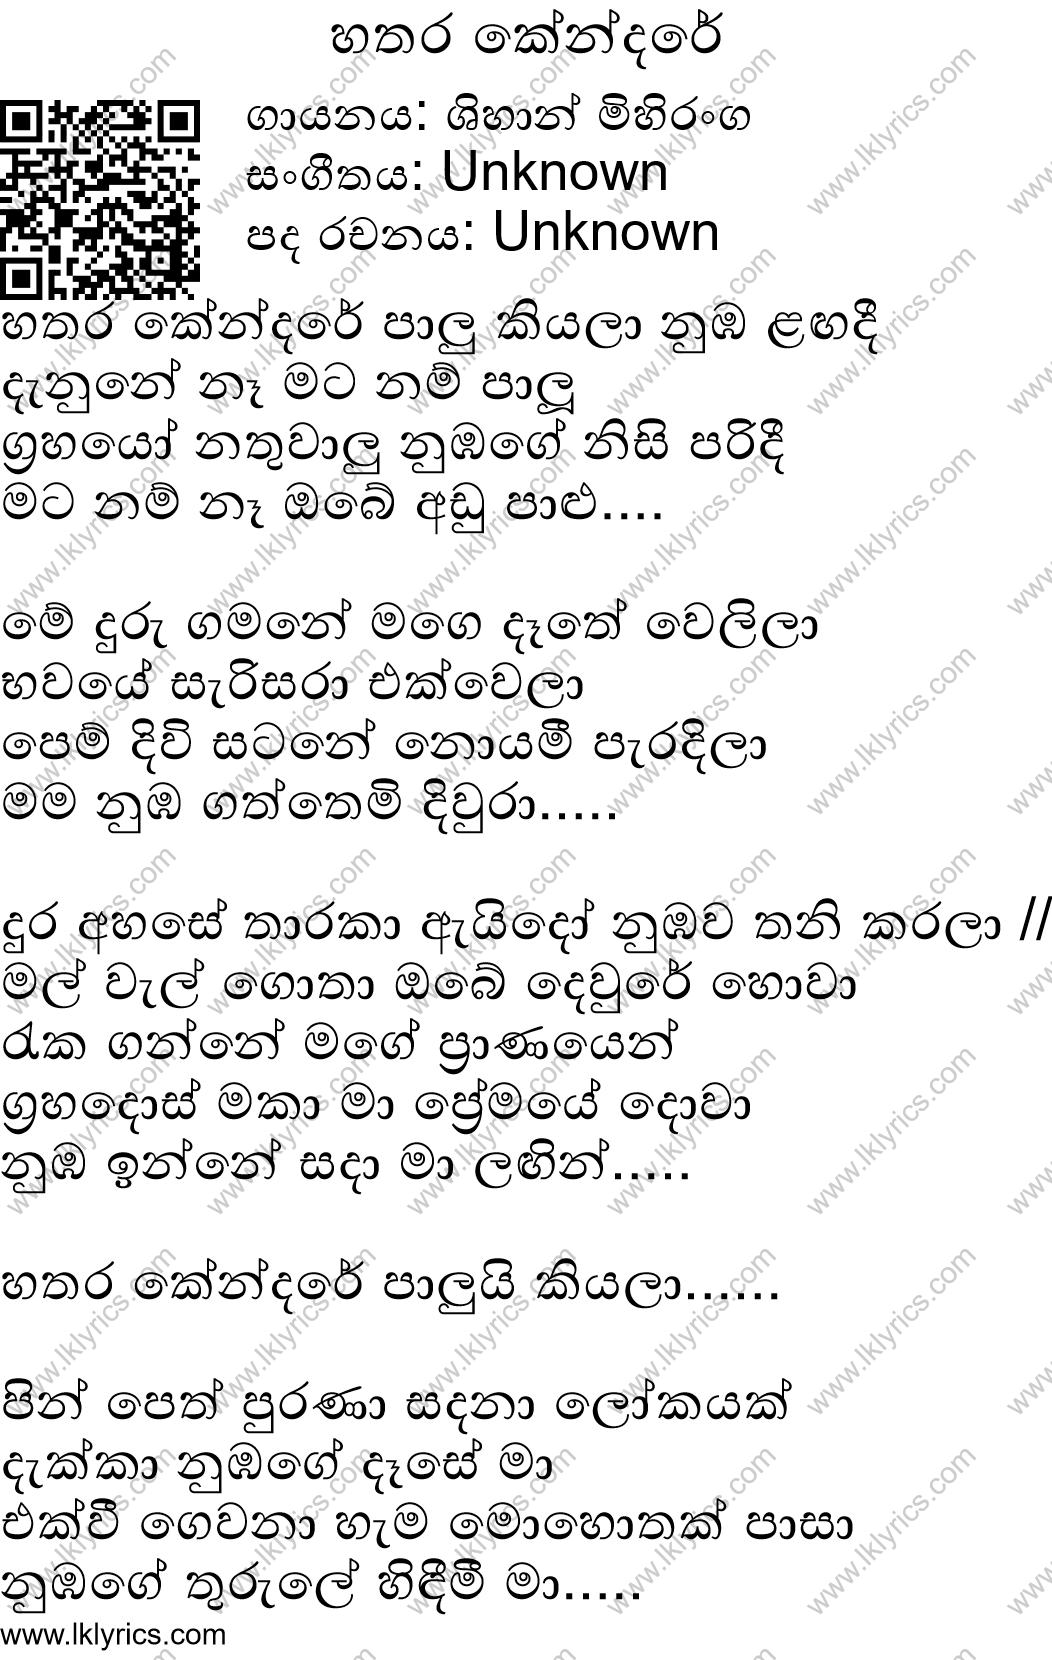 hathara kendare palu song